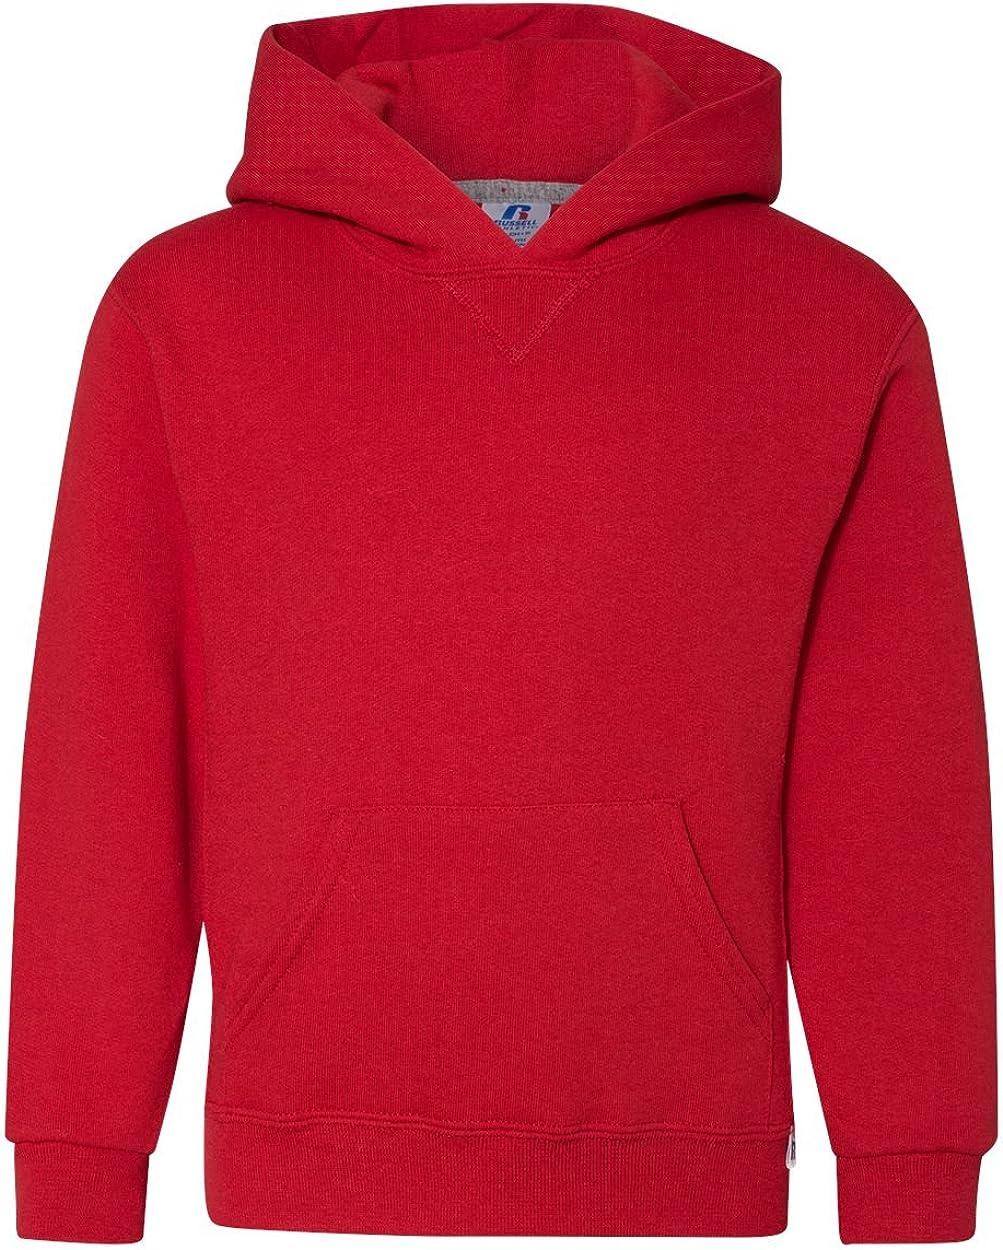 Russell Athletic Boys' Dri-Power Fleece Hoodies and Sweatshirts: Clothing